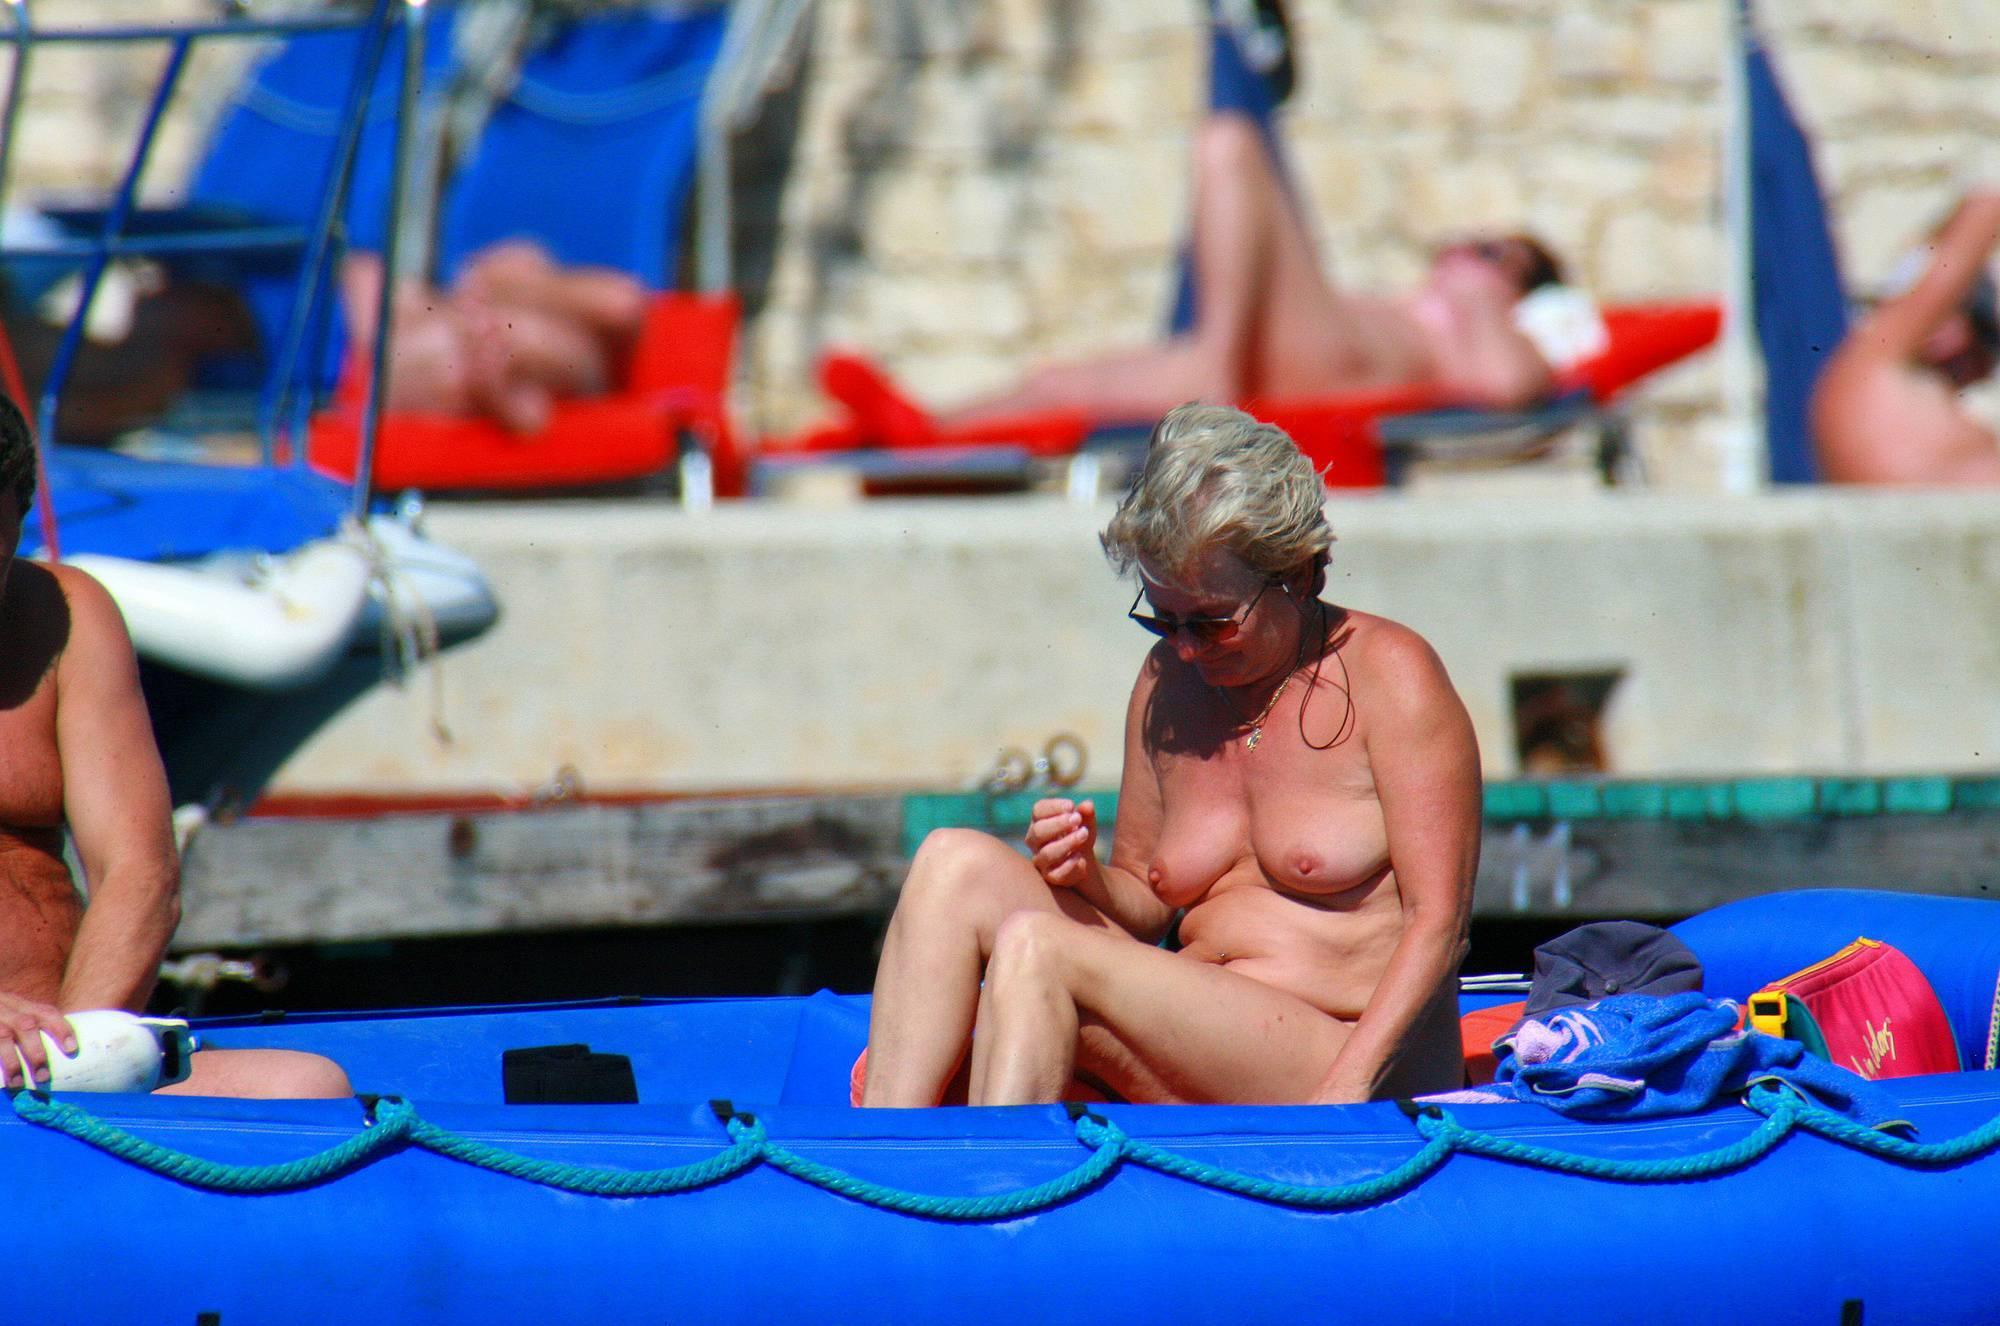 Purenudism Pics-Uka FKK In-Water Boating - 2